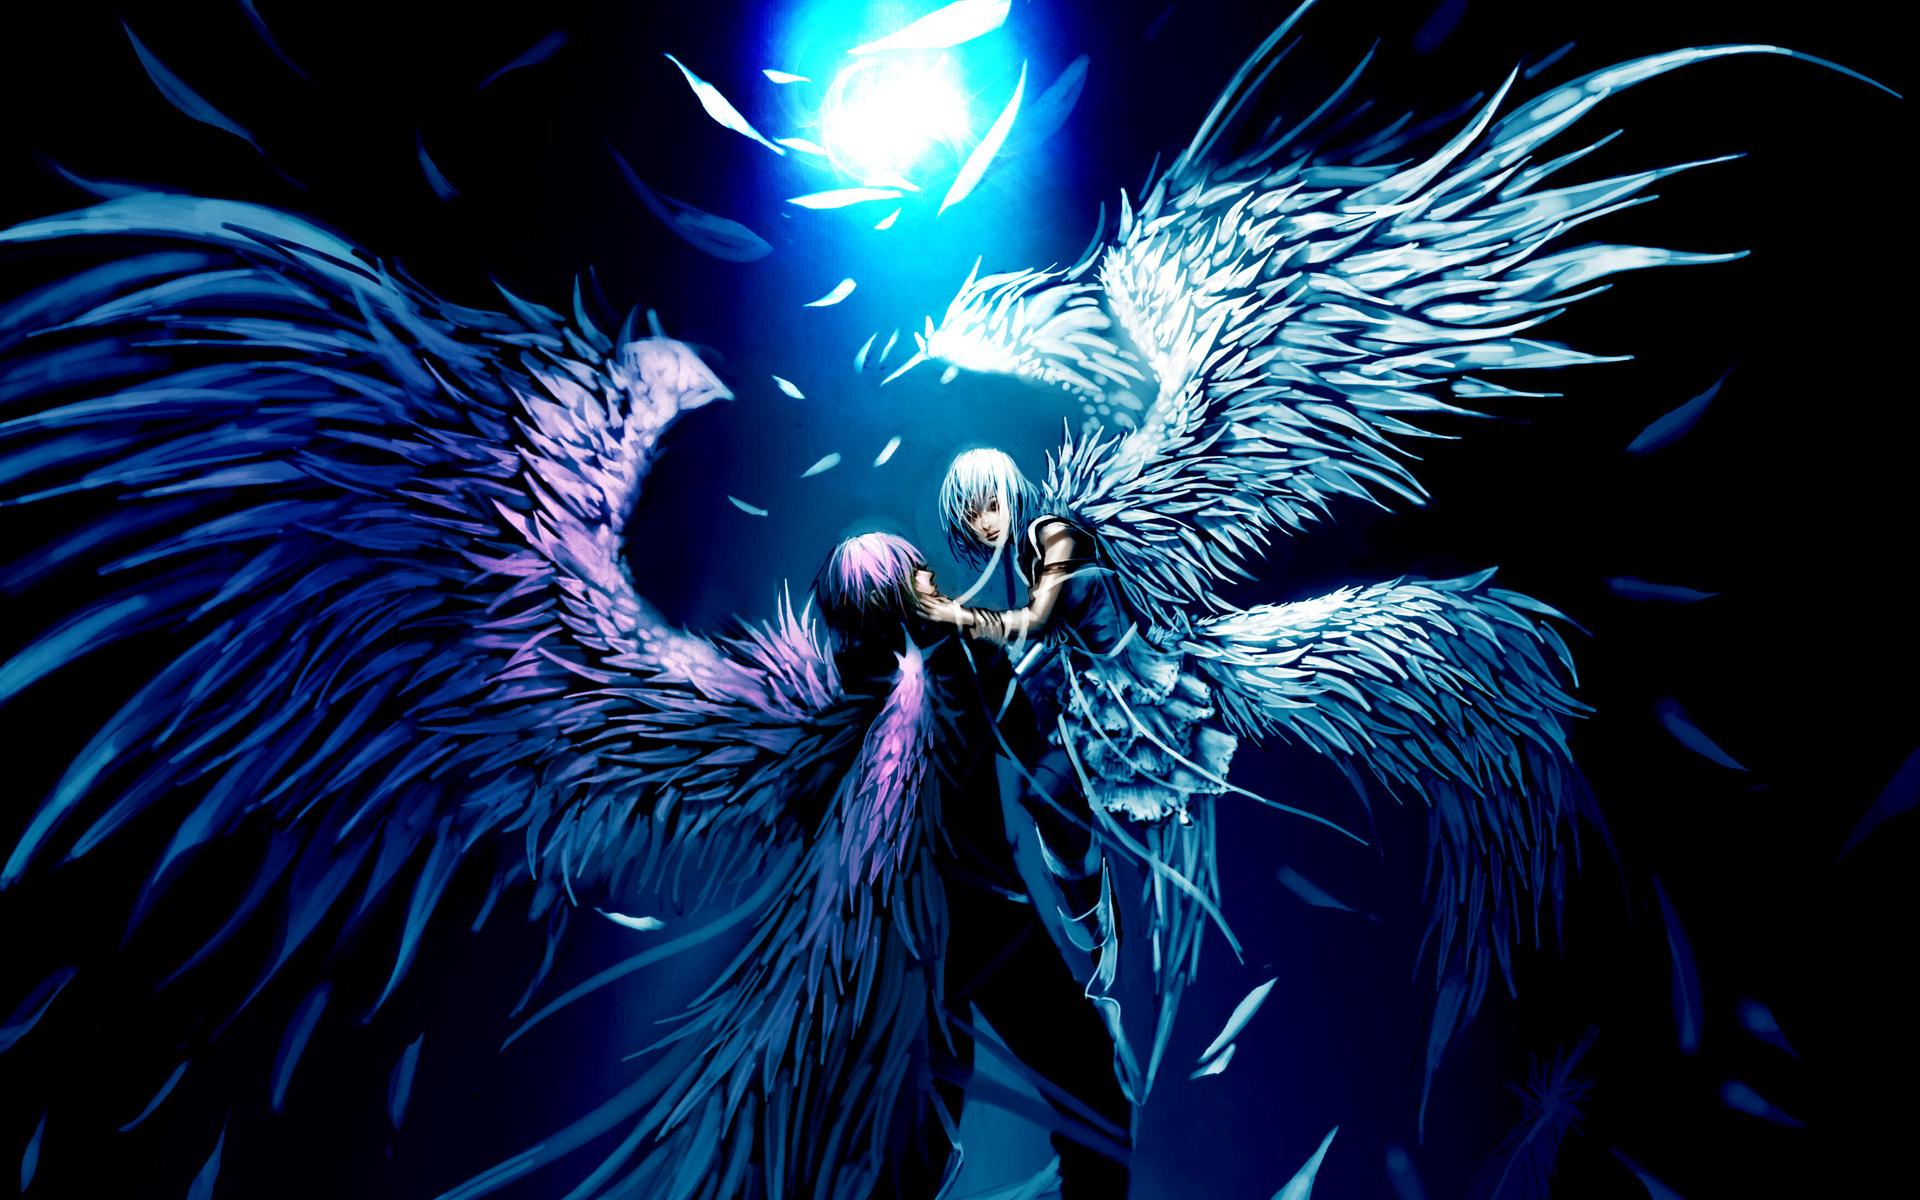 genki de deviantart com anime angels fantasy wings love romance mood 1920x1200